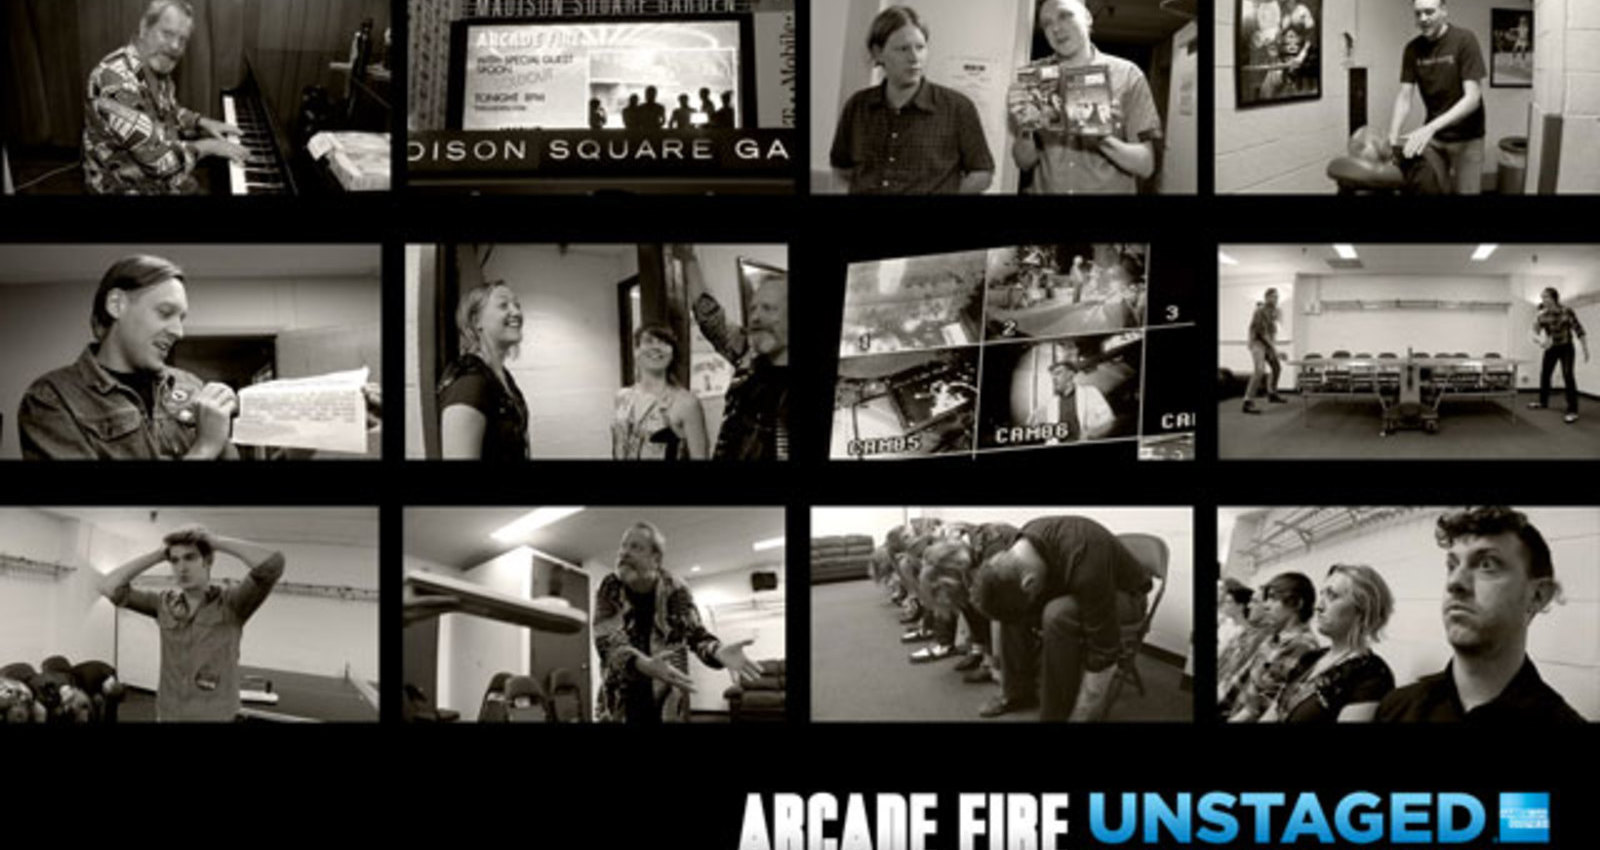 Arcade Fire UNSTAGED Pre-show